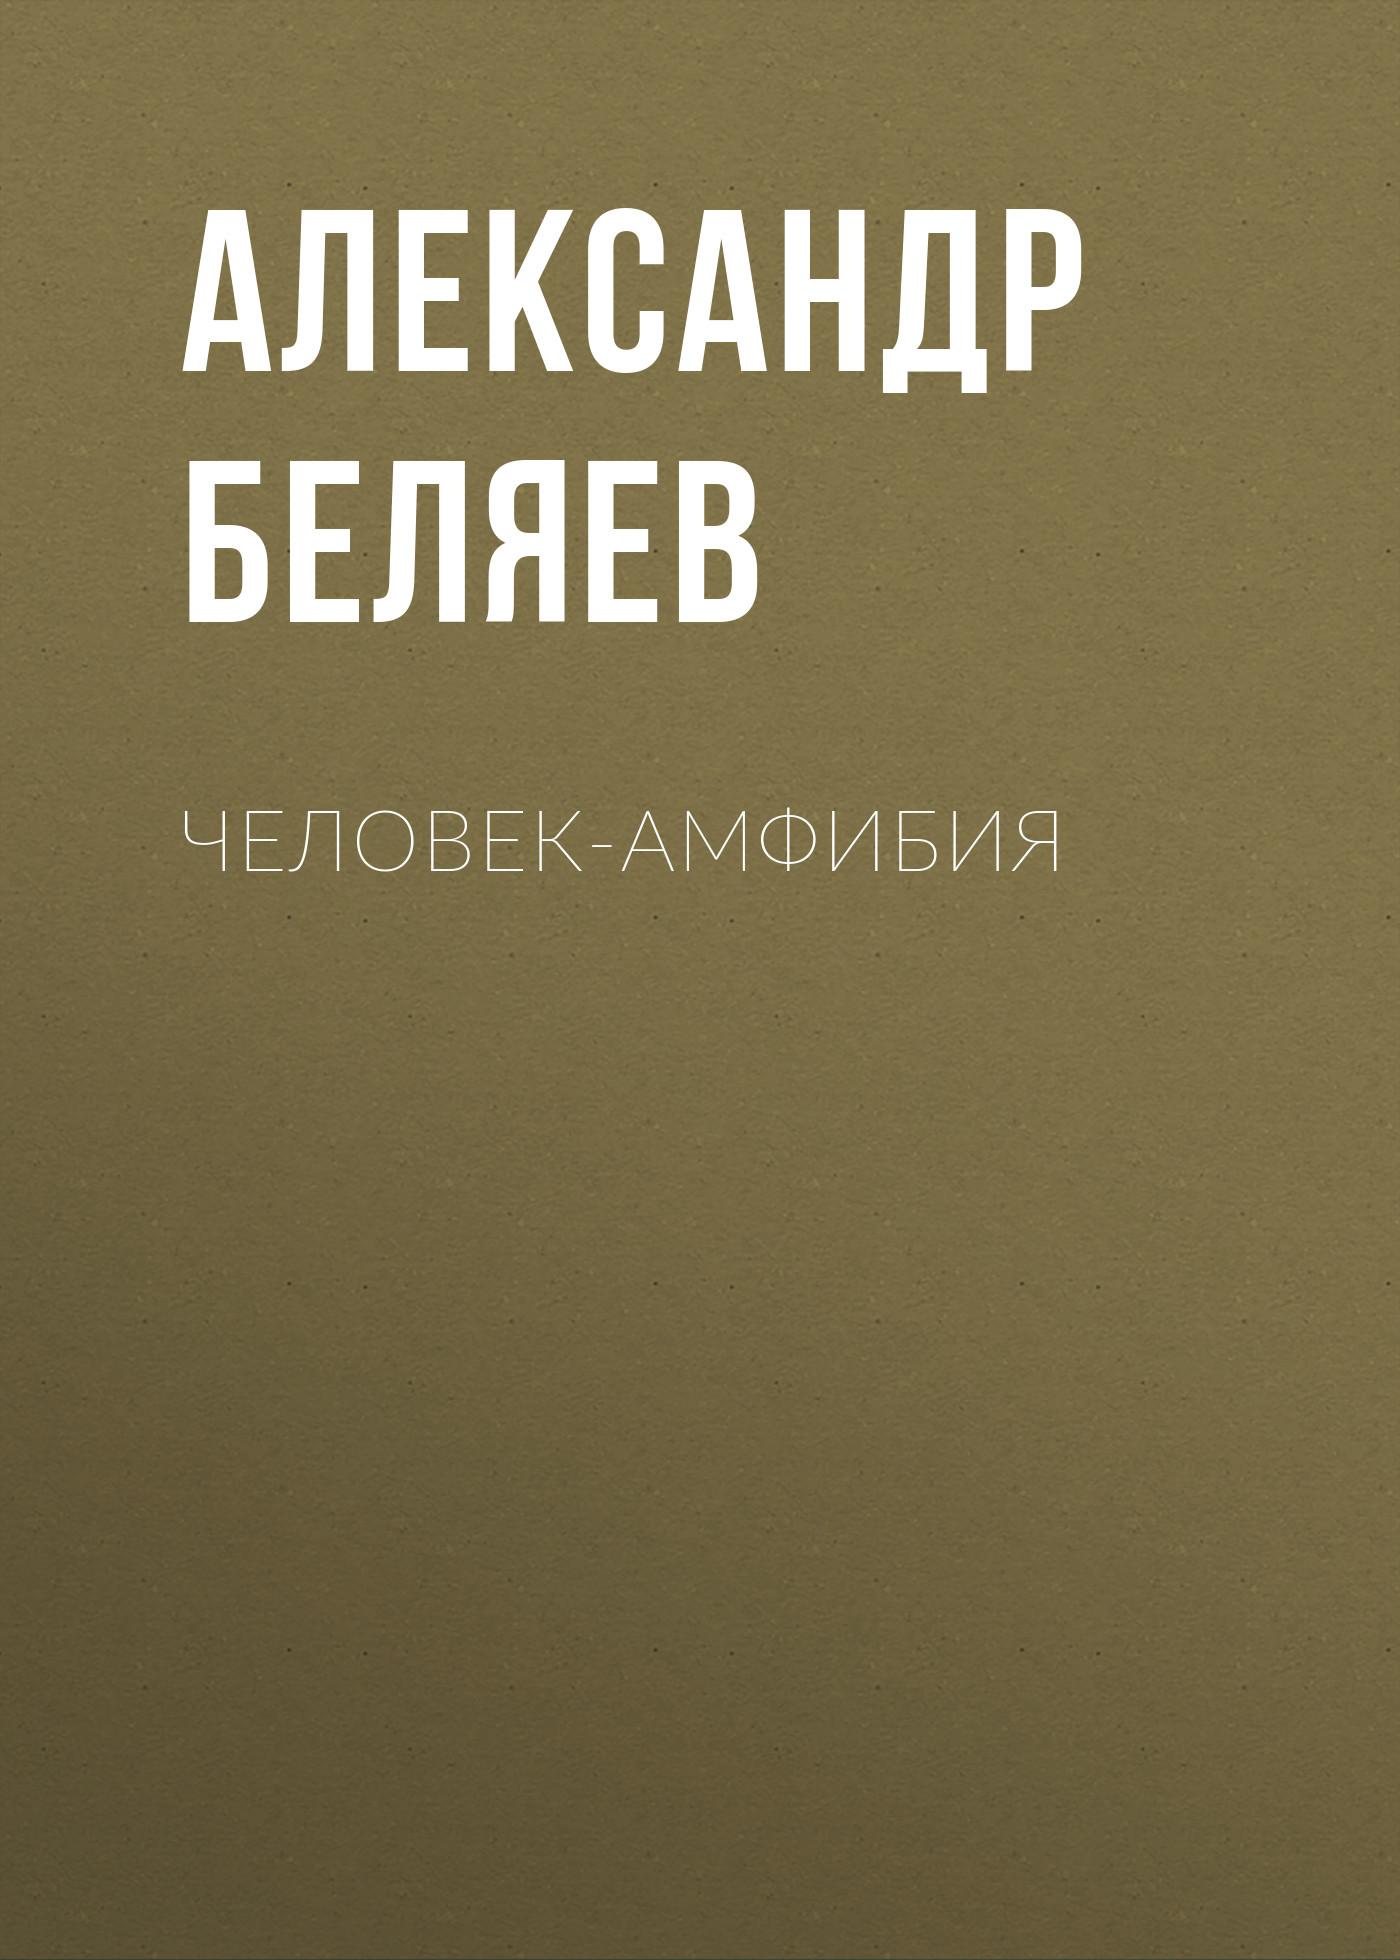 Александр Беляев Человек-амфибия душная ночь 2018 11 20t20 00